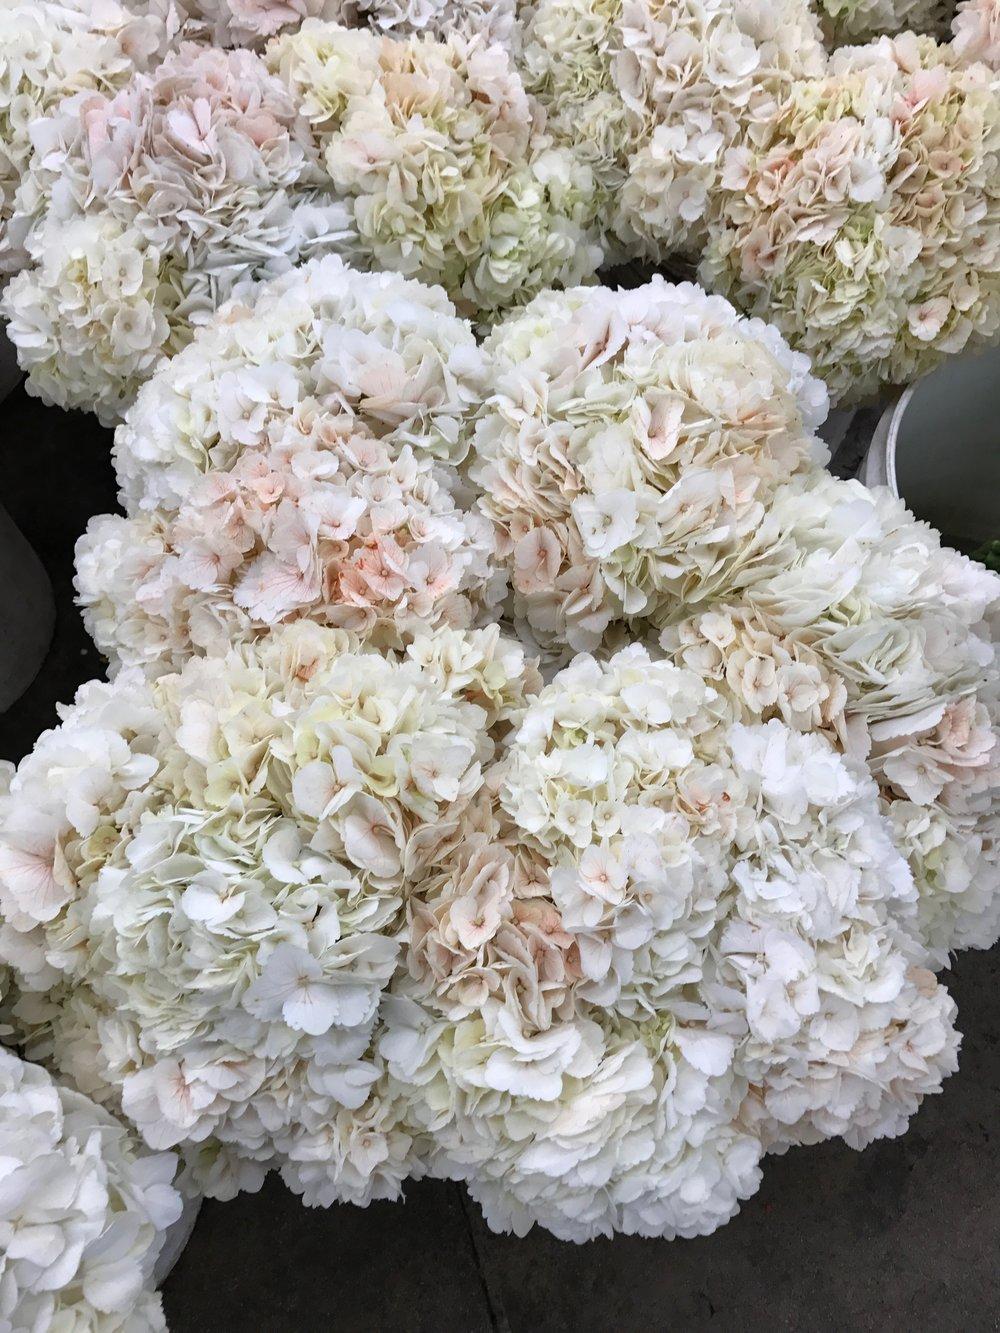 Los Angeles Flower Market